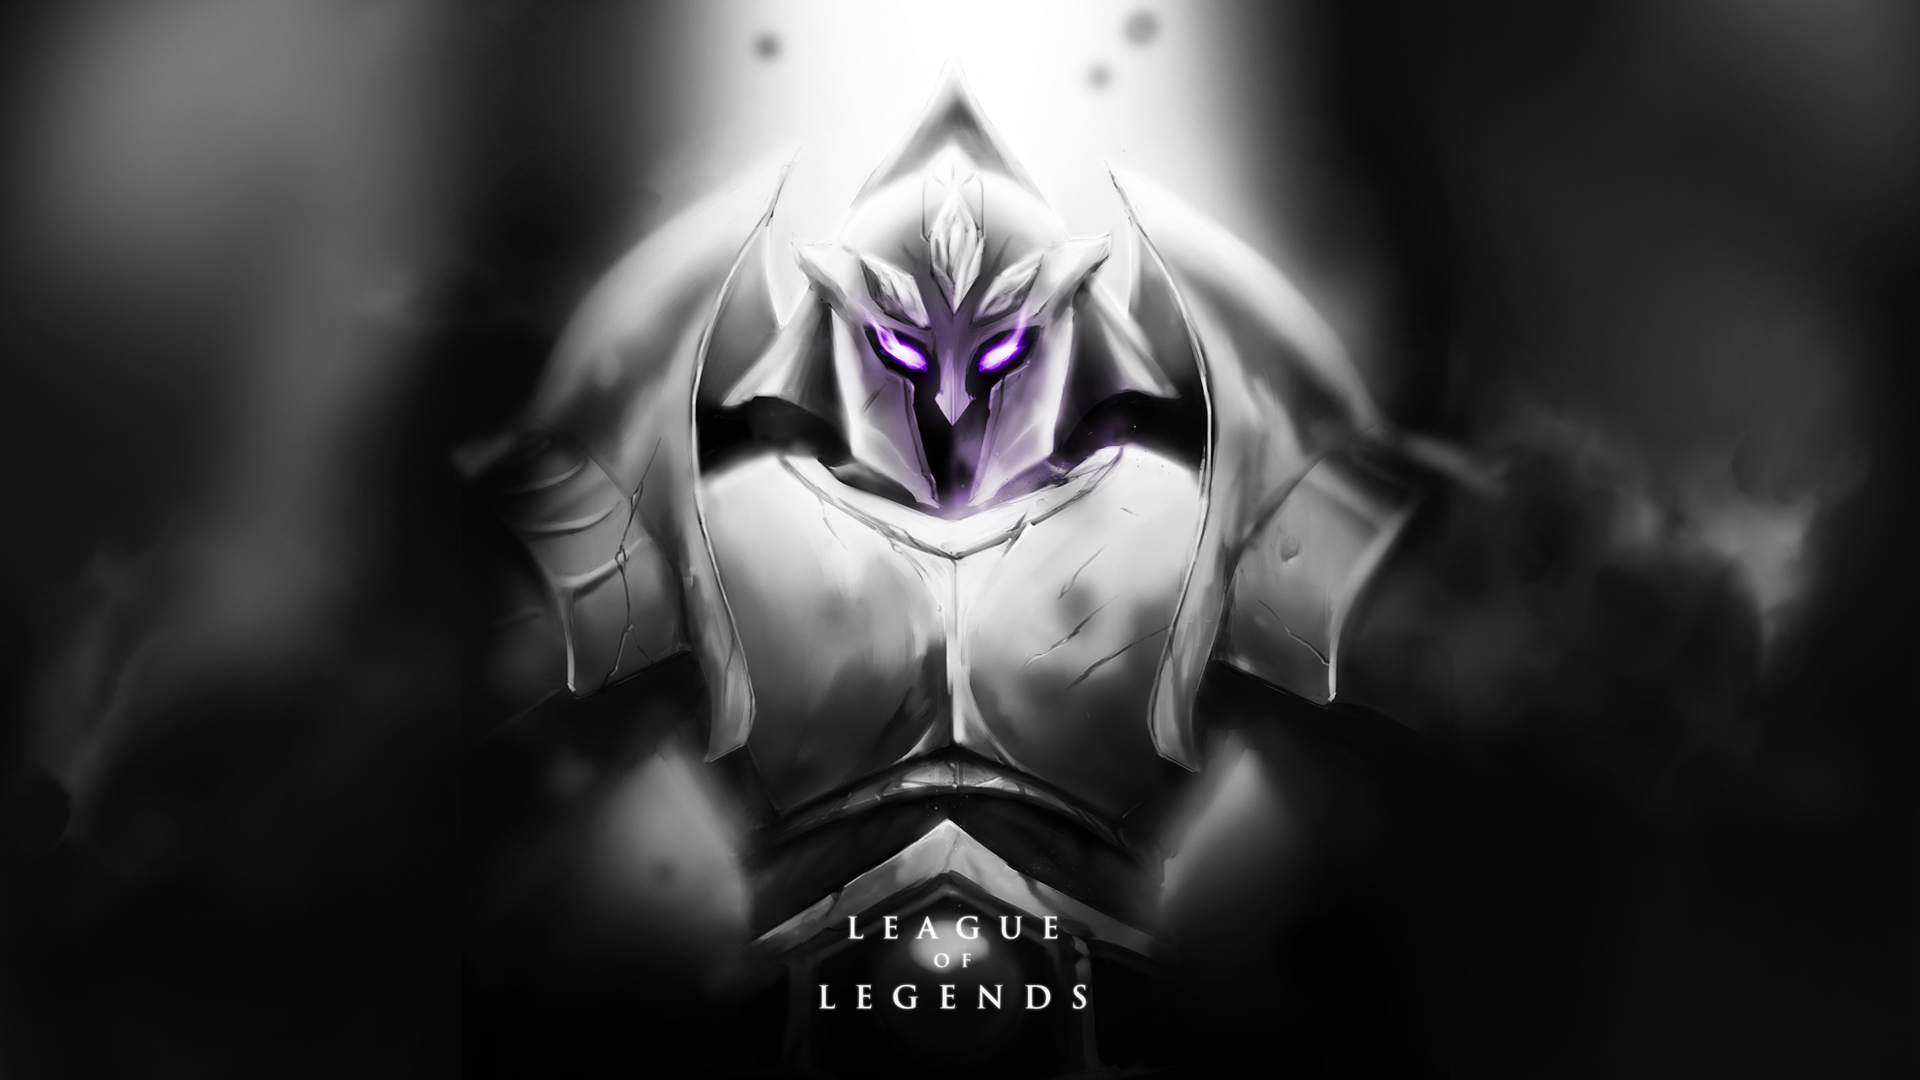 League of Legends wallpaper 99